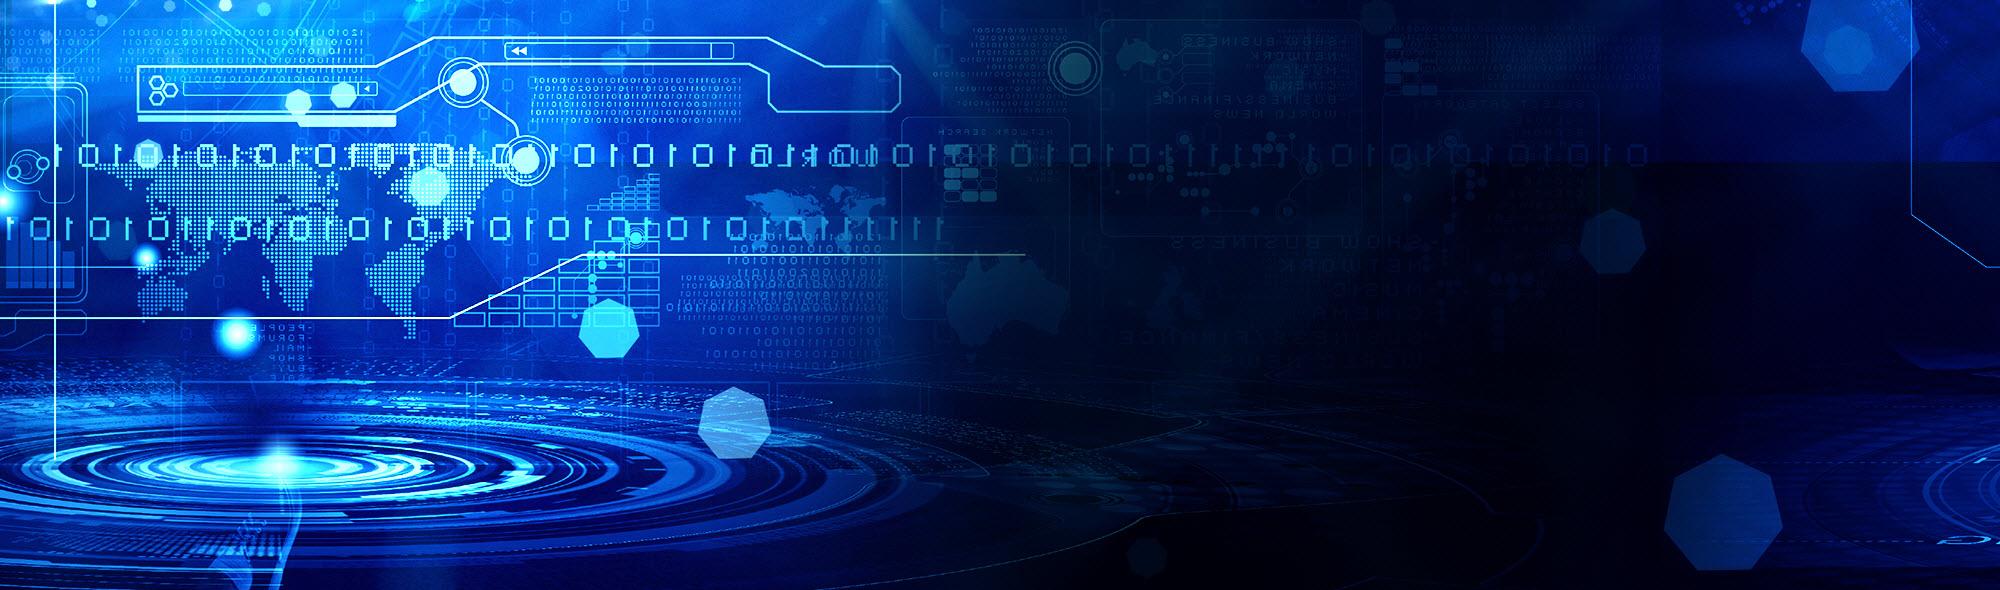 Data warehouse solutions, from terabytes to petabytes